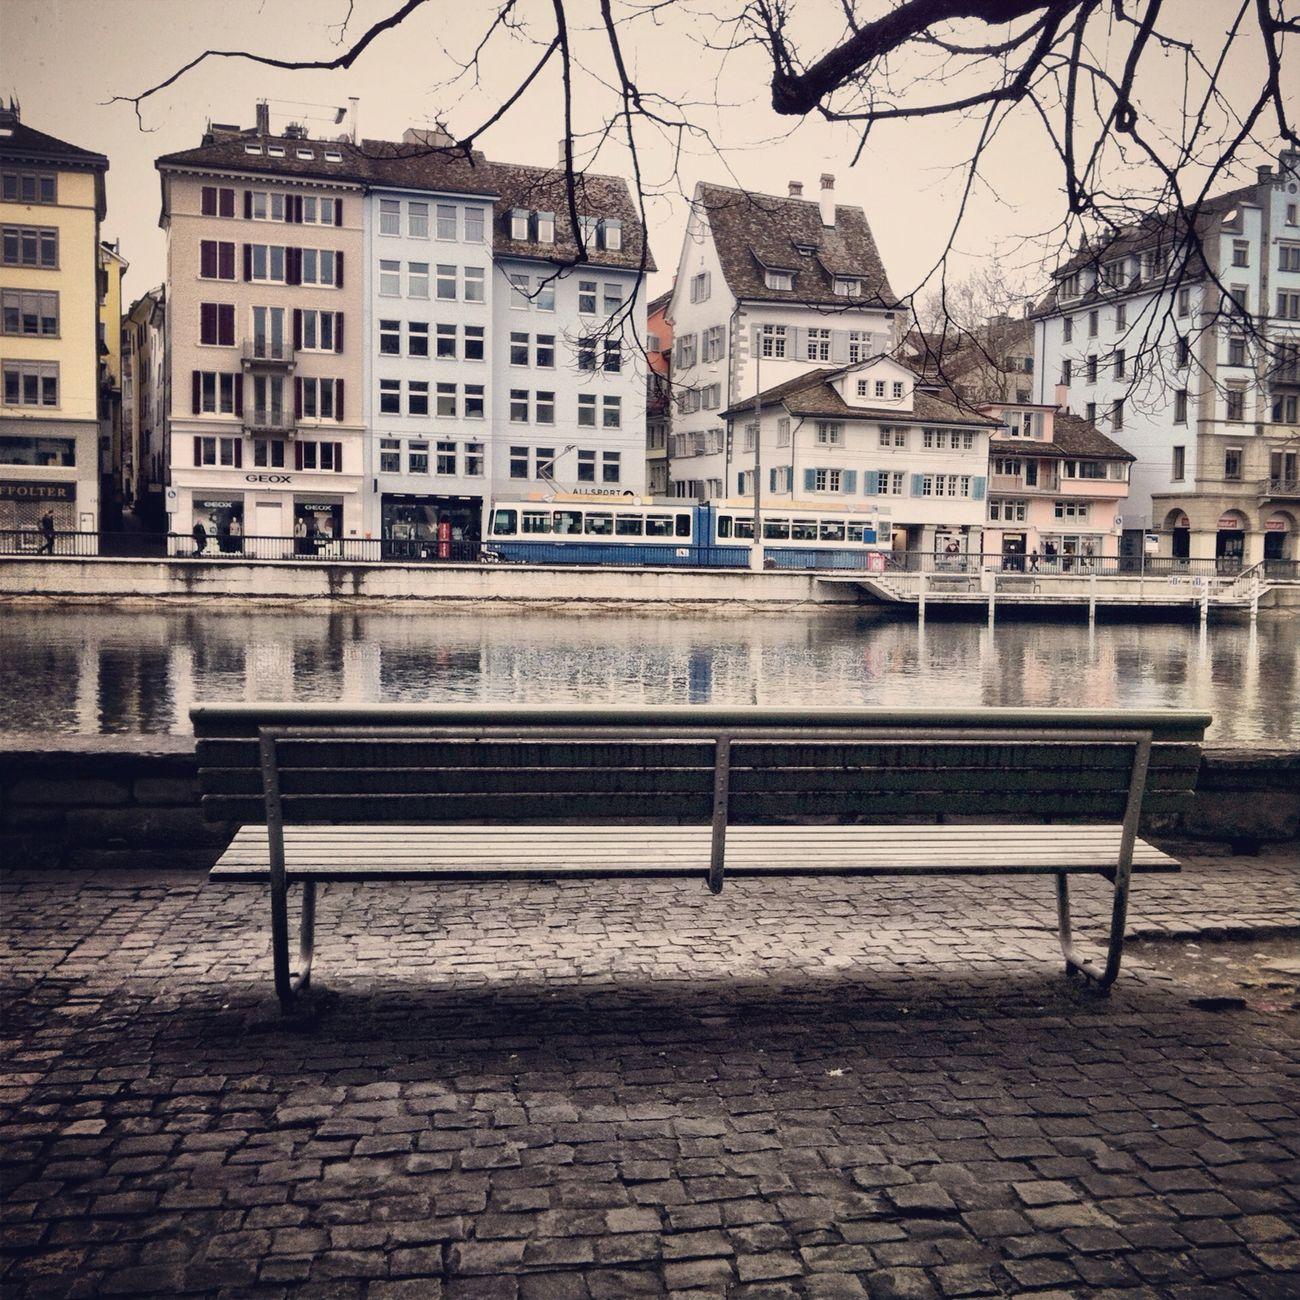 streetphotography at switzerland Streetphotography